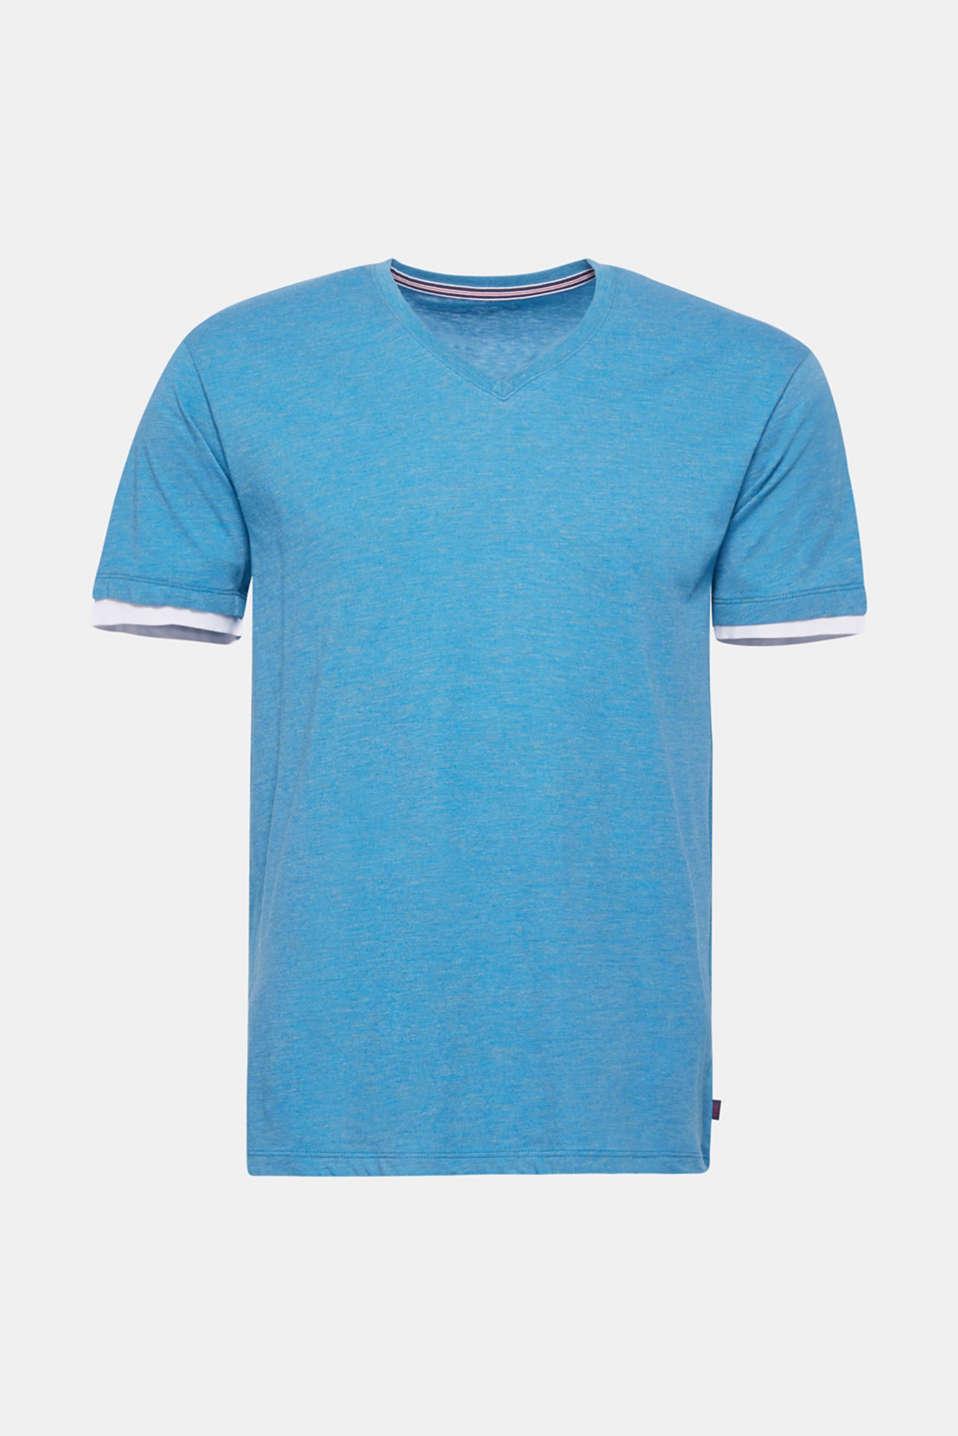 T-Shirts, PETROL BLUE, detail image number 6